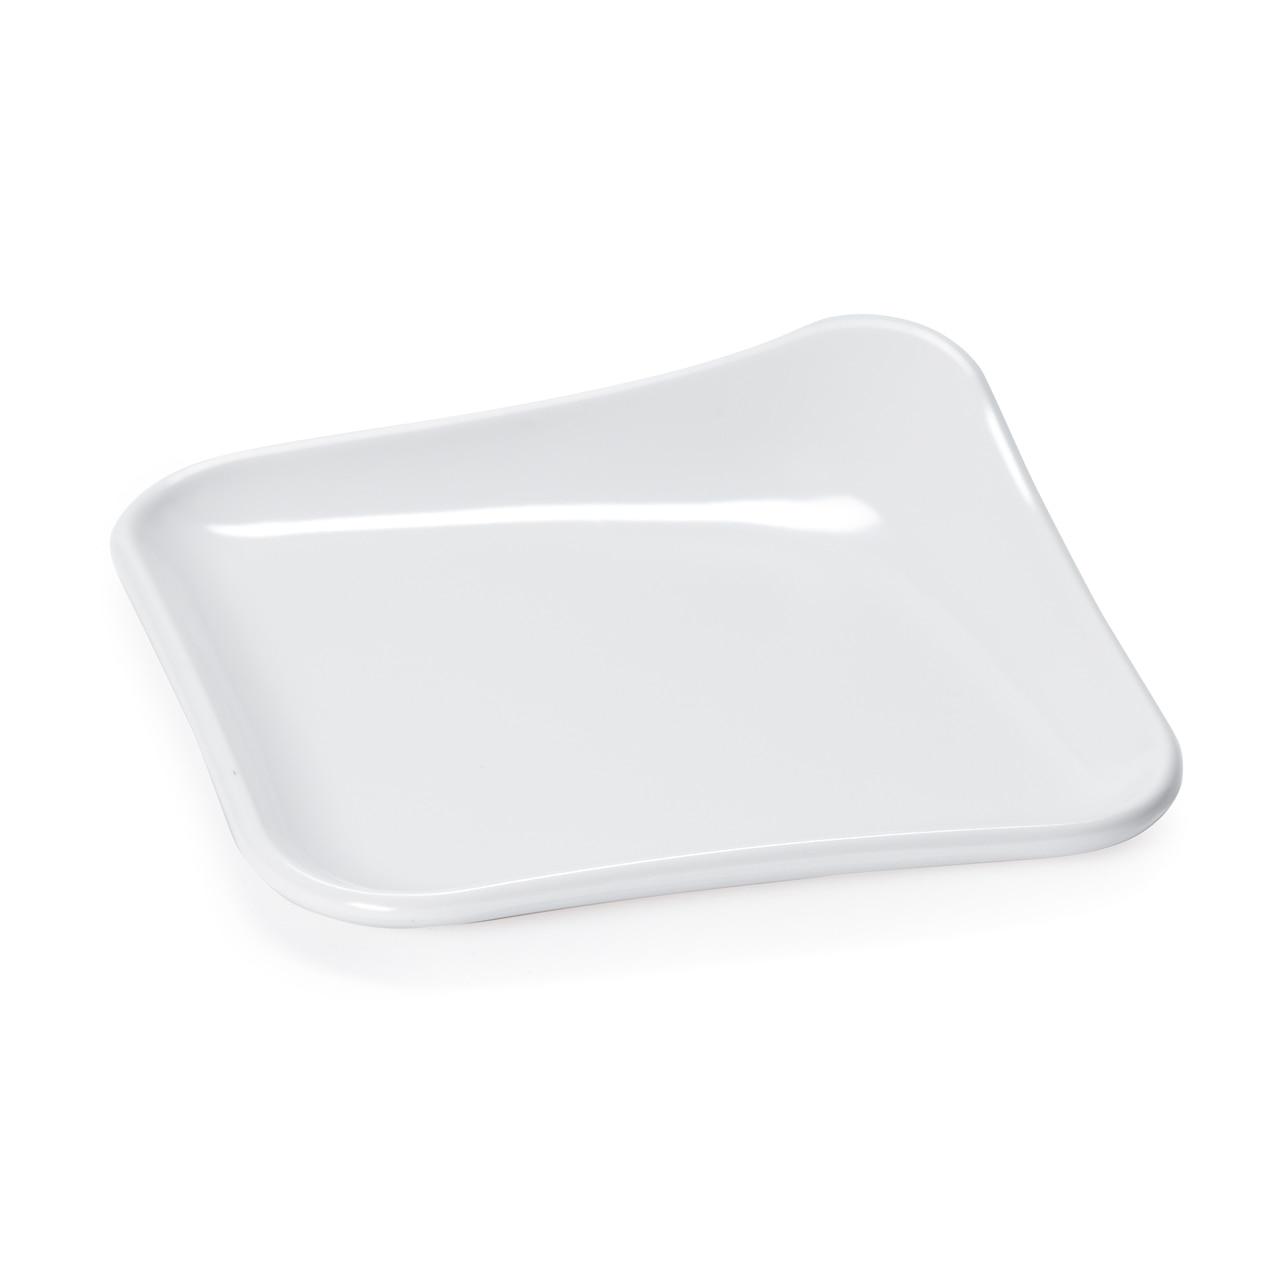 "4"" Melamine Square Plate"